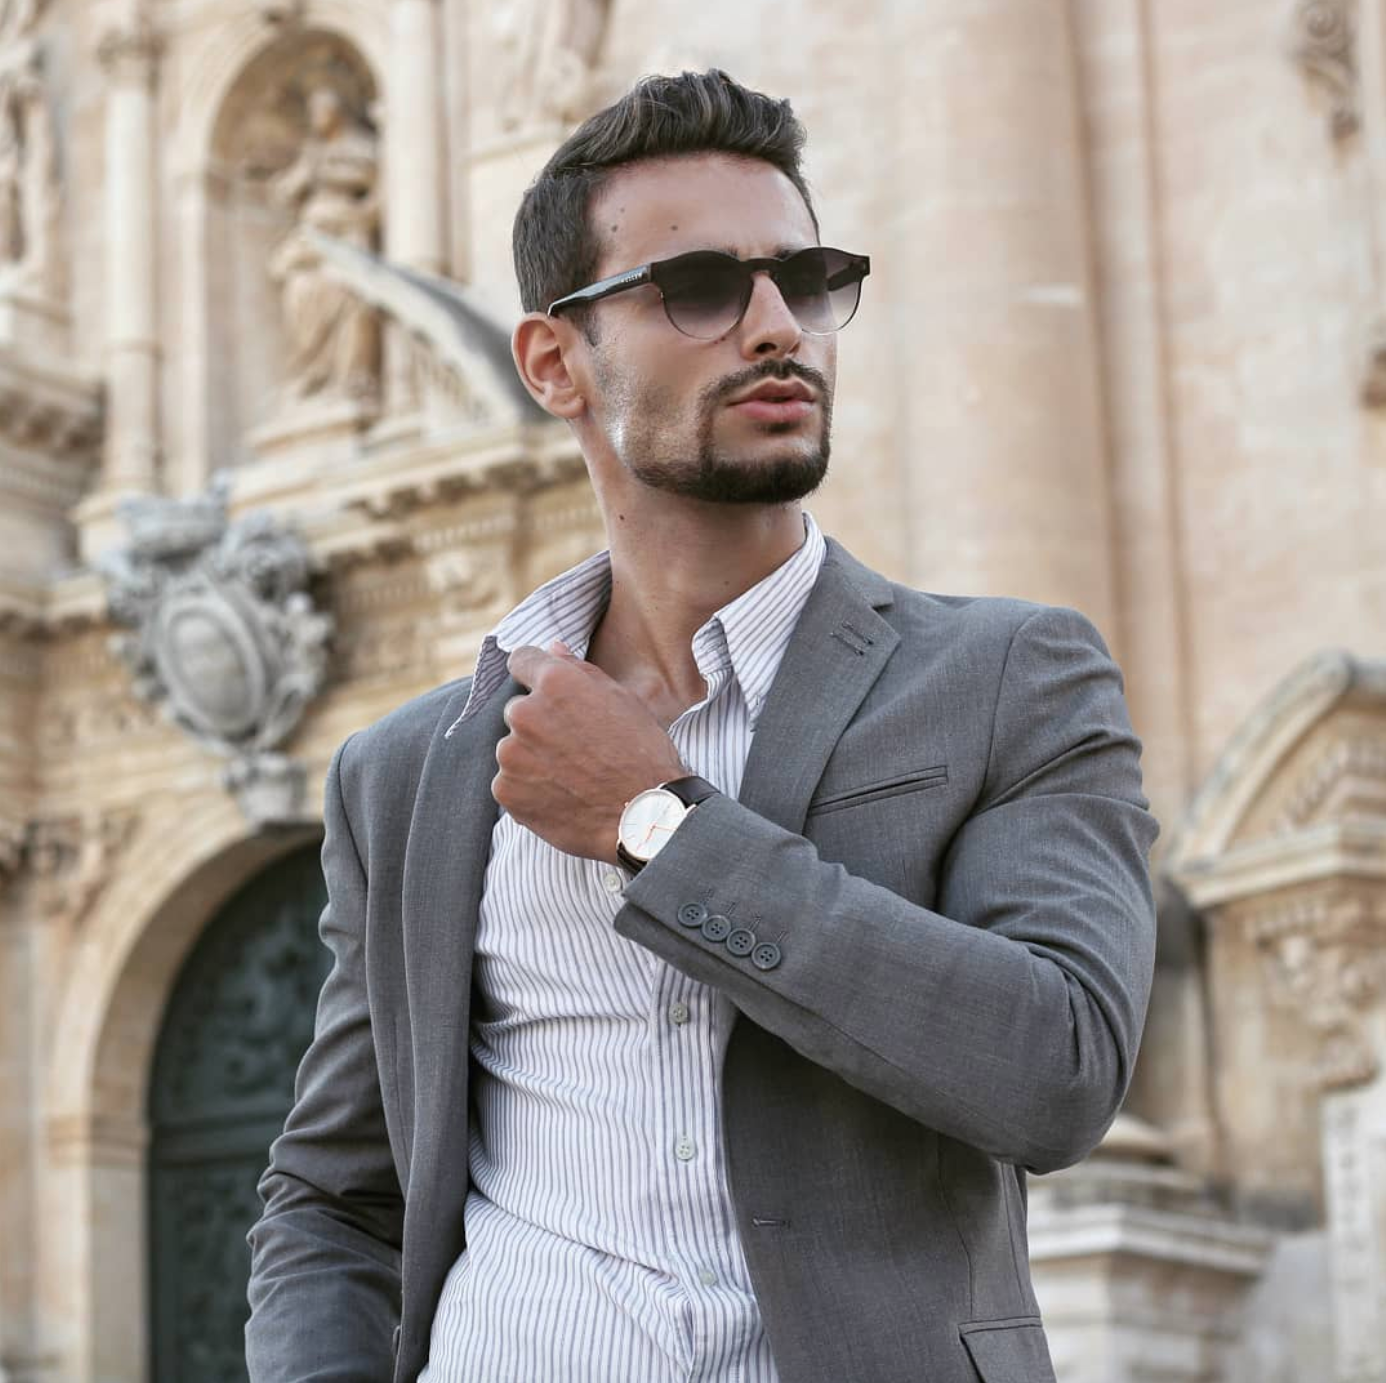 corrado firera, modelli italiani, influencer, fashion blogger